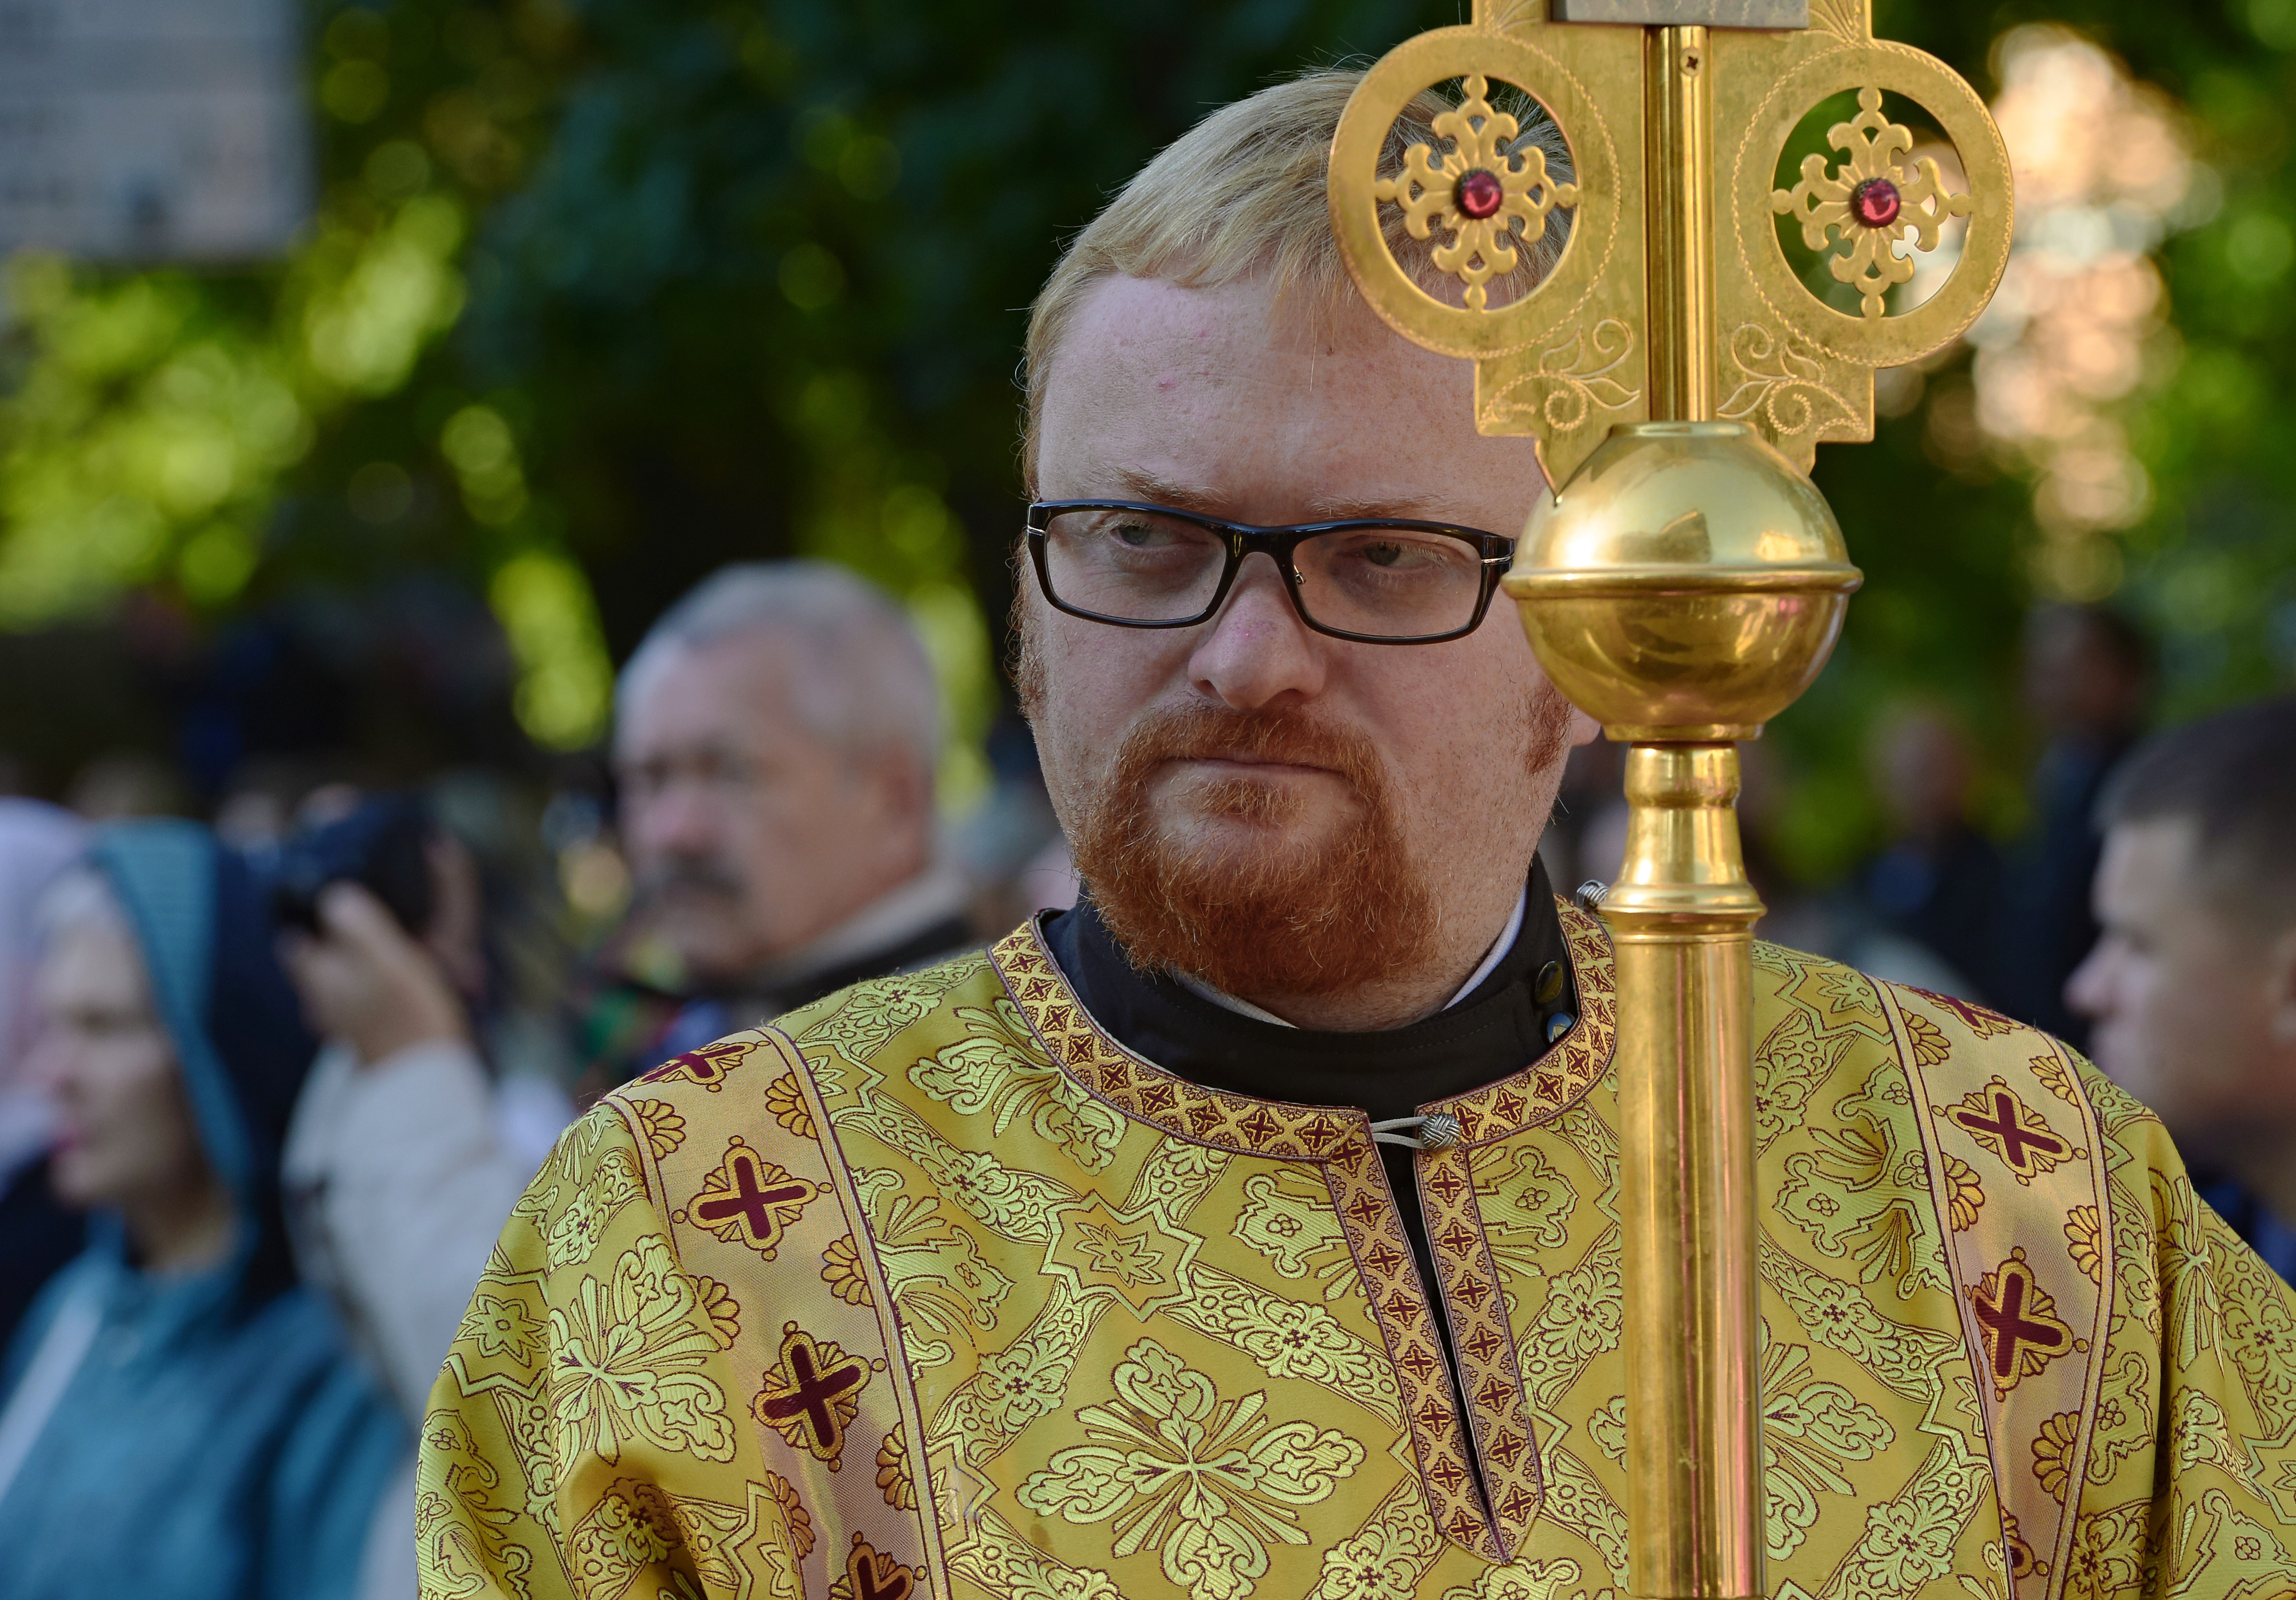 <p>Виталий Милонов. Фото: &copy; РИА Новости/Алексей Даничев</p>